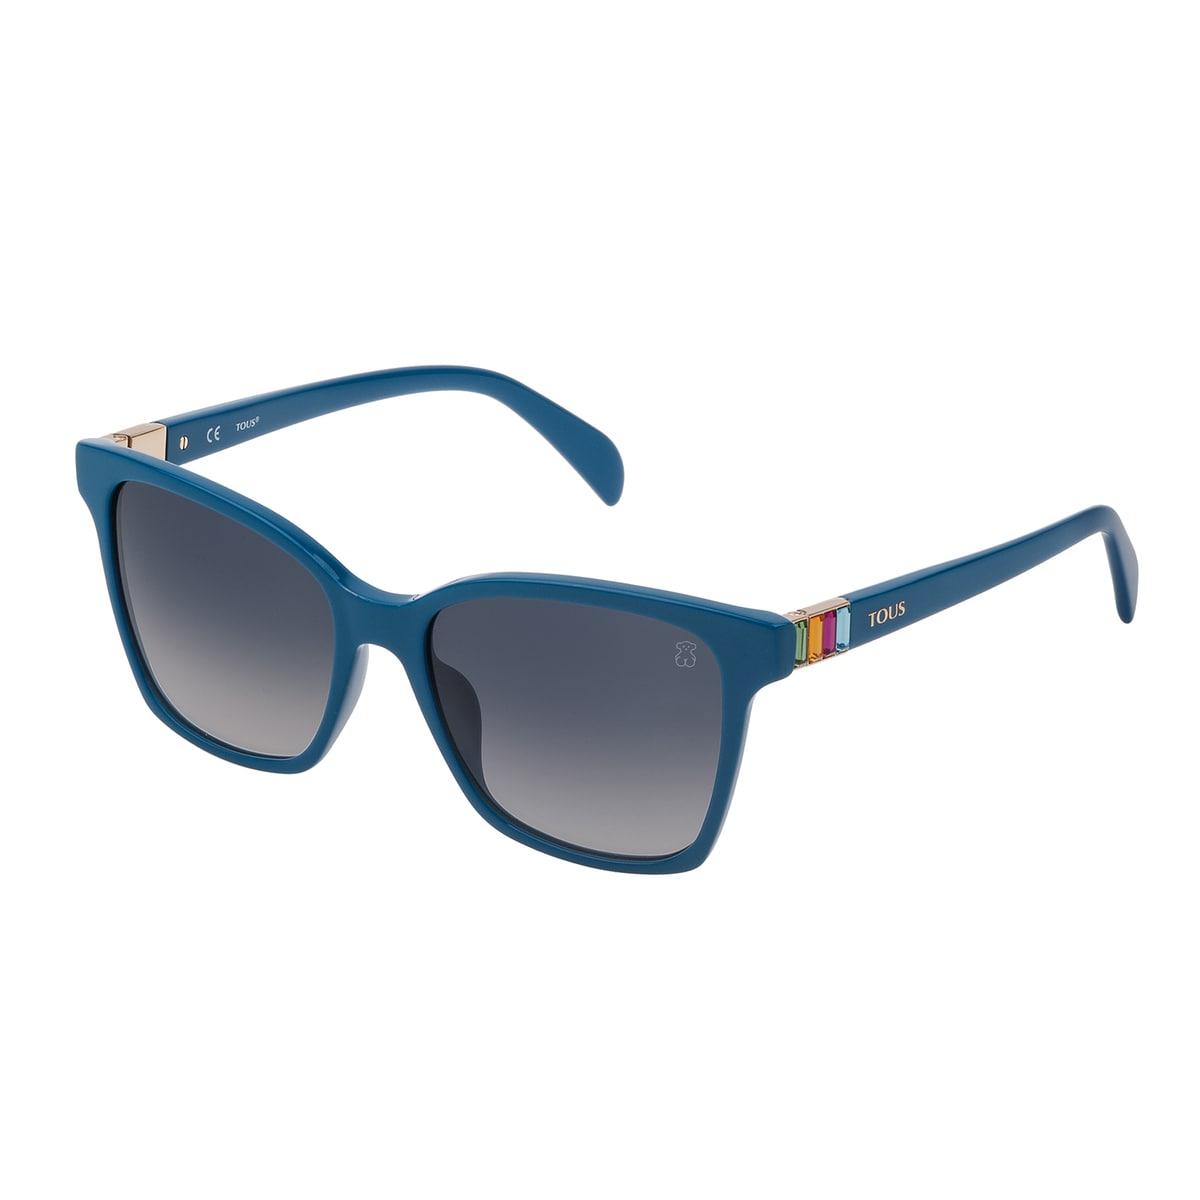 Blue Acetate Gems Squared Sunglasses